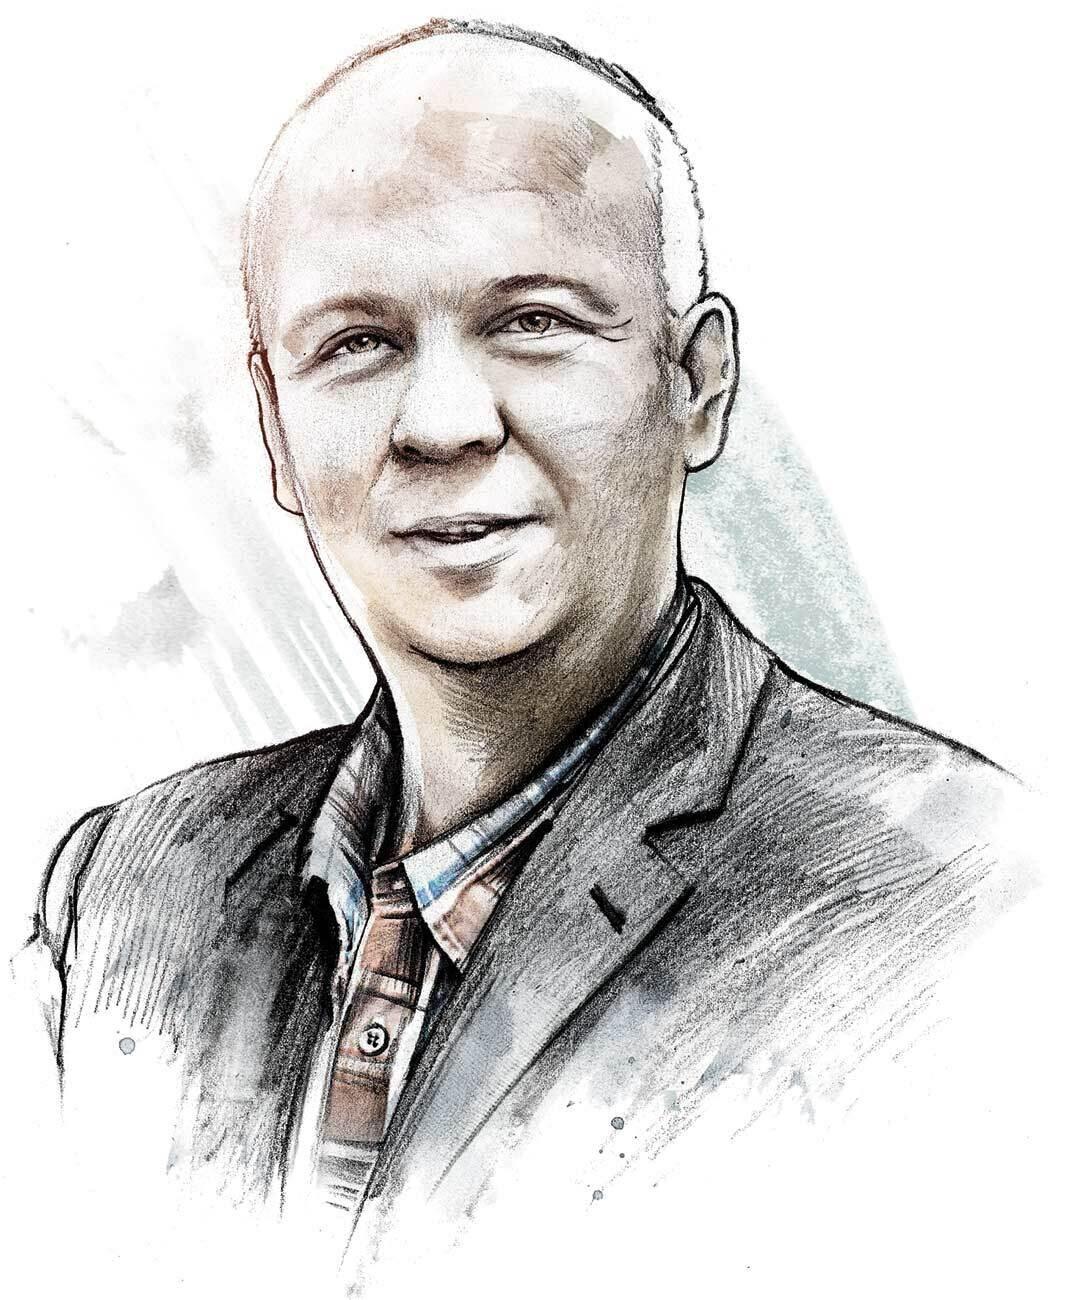 Spuhler Portrait illustration watercolor - Kornel Illustration | Kornel Stadler portfolio